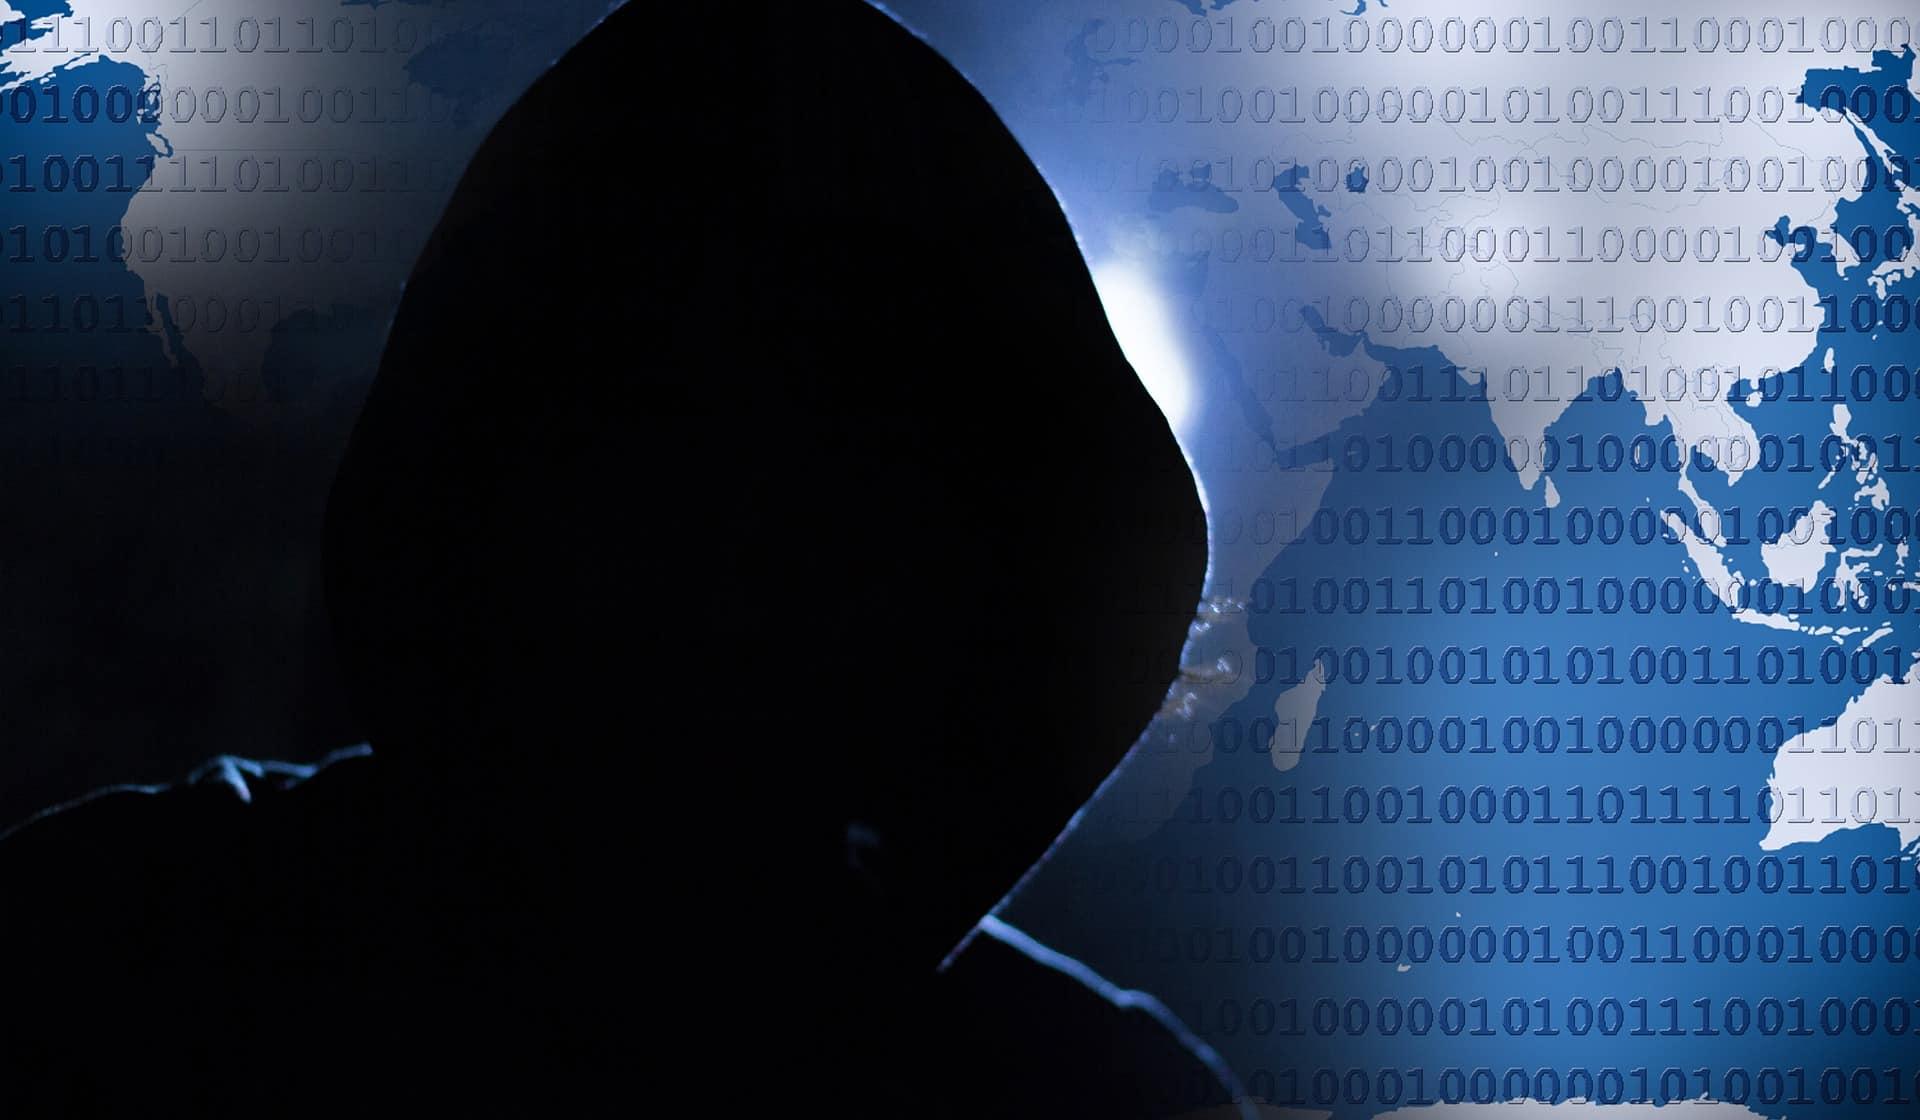 Un hacker défie Apple de verser 2.5 millions de dollars à Amnesty International